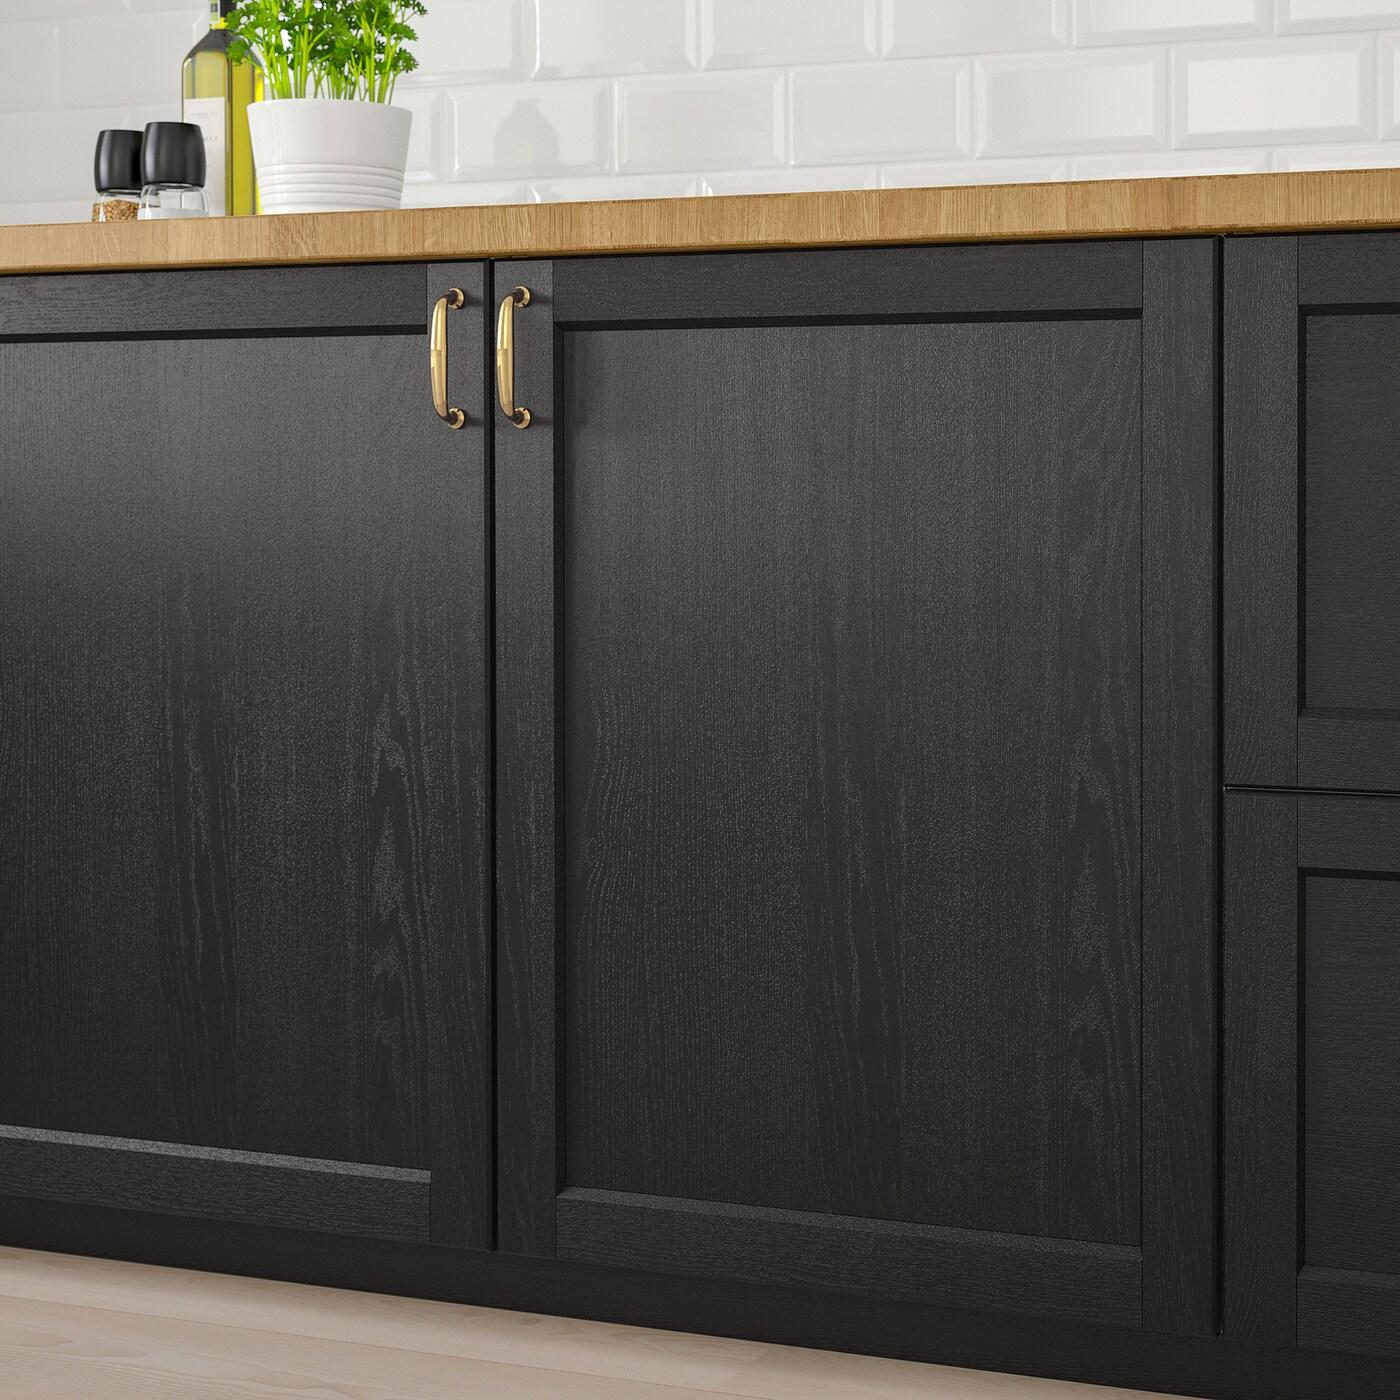 LERHYTTAN Door - black stained 8x8 cm